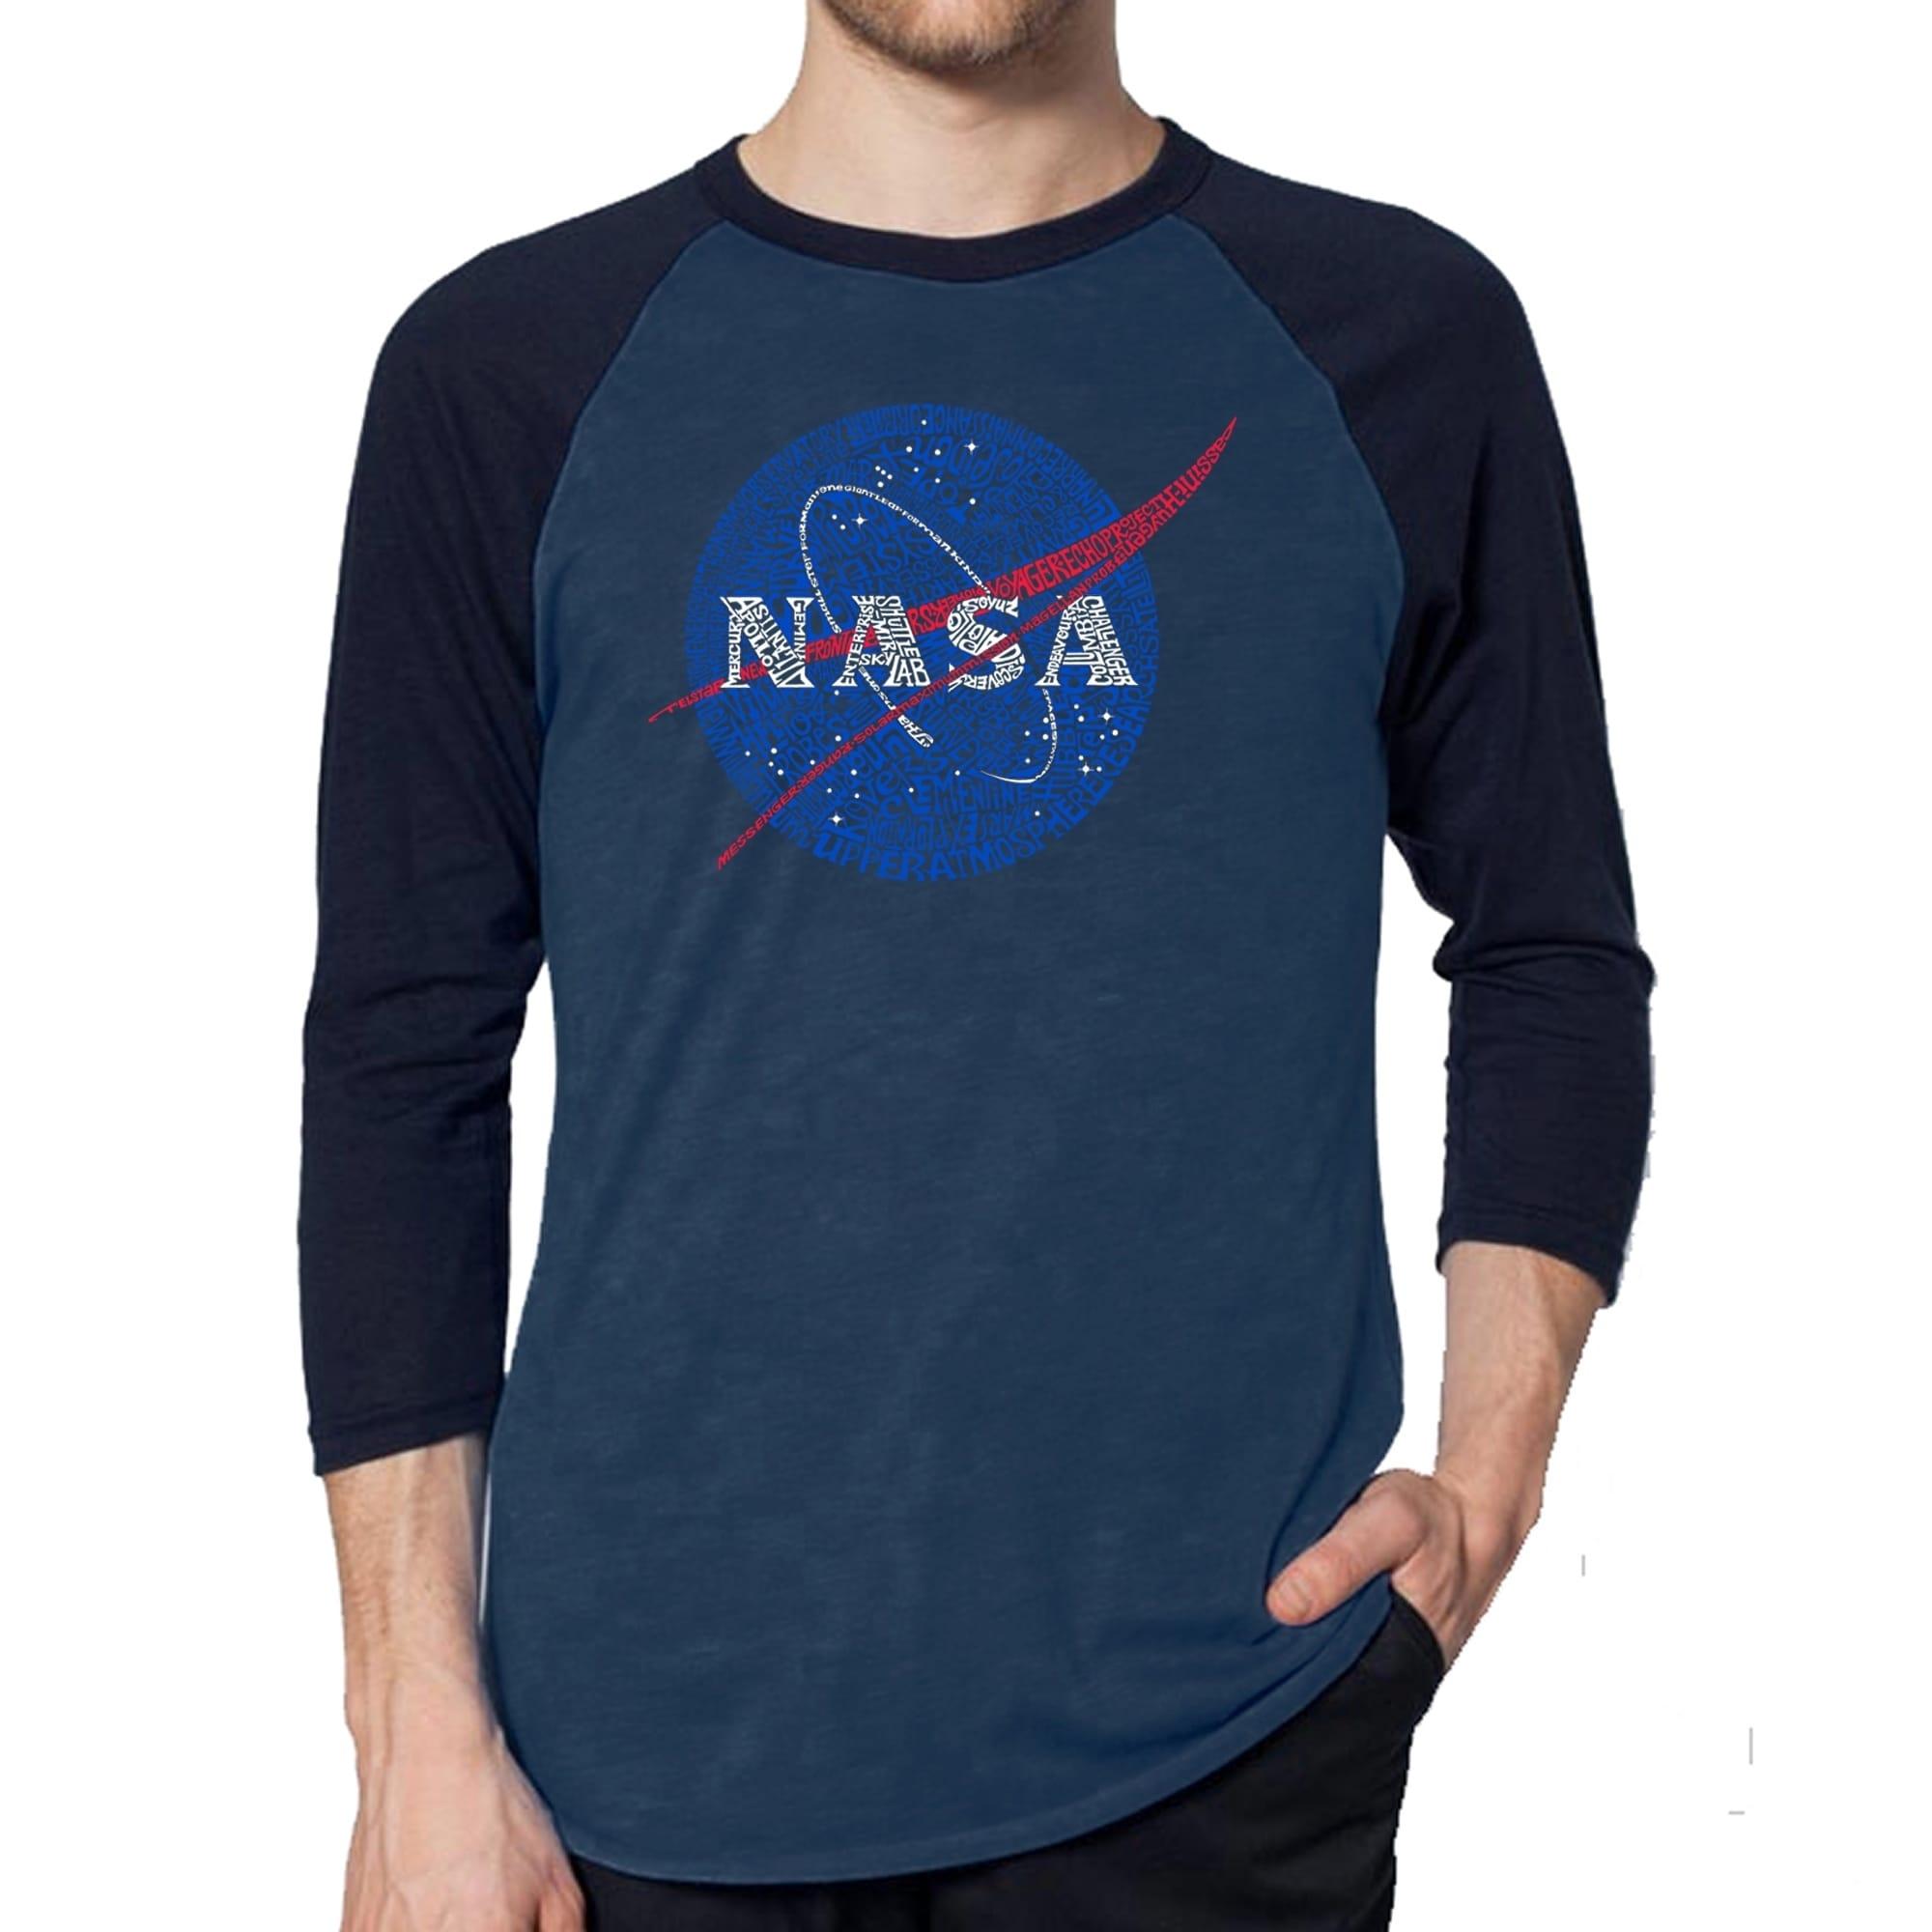 5465707e5da4 Los Angeles Pop Art Men's Raglan Baseball Word Art T-shirt - NASA's Most  Notable Missions